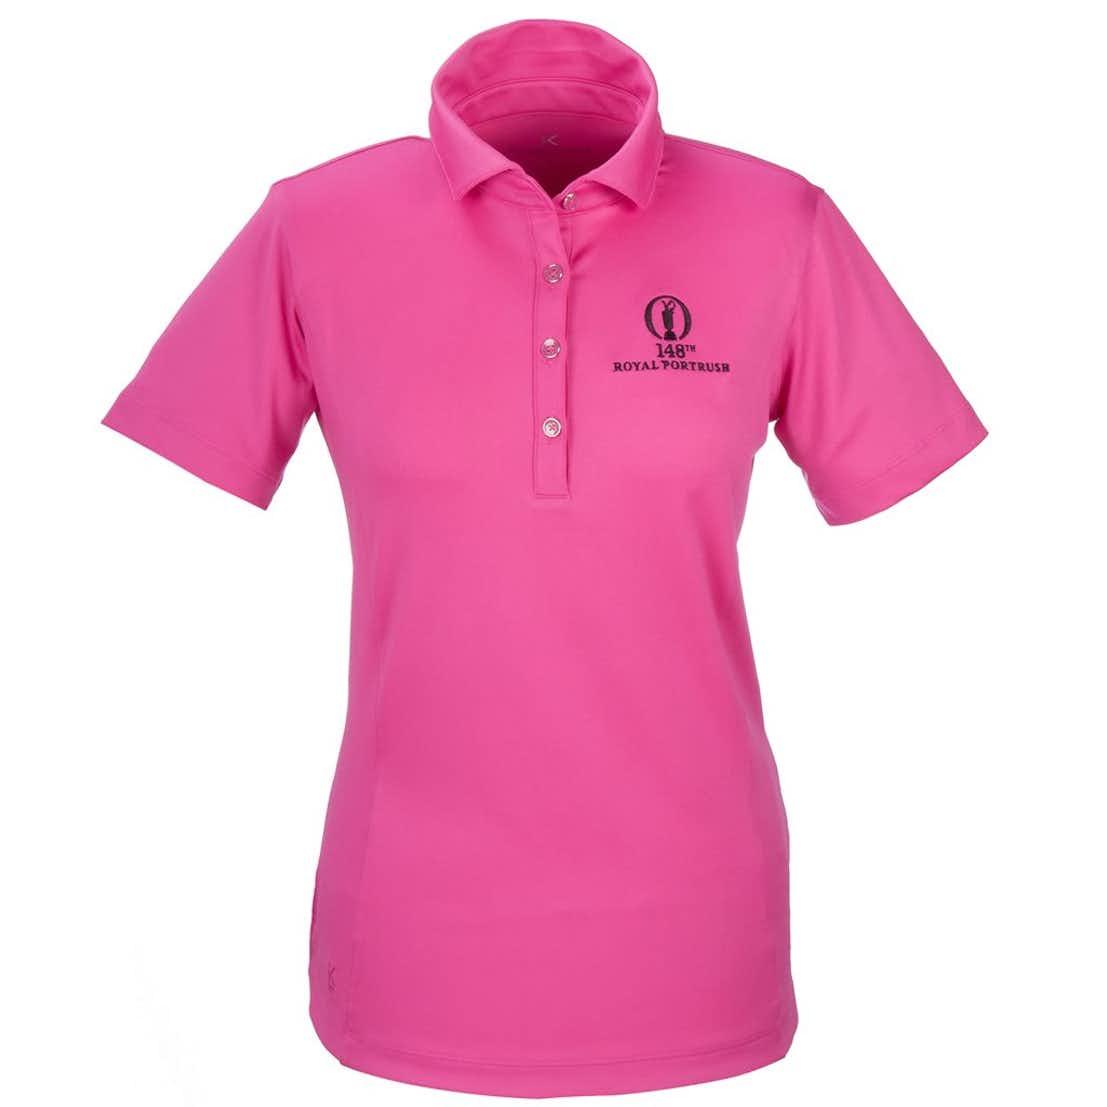 148th Royal Portrush Kate Lord Plain Polo - Pink